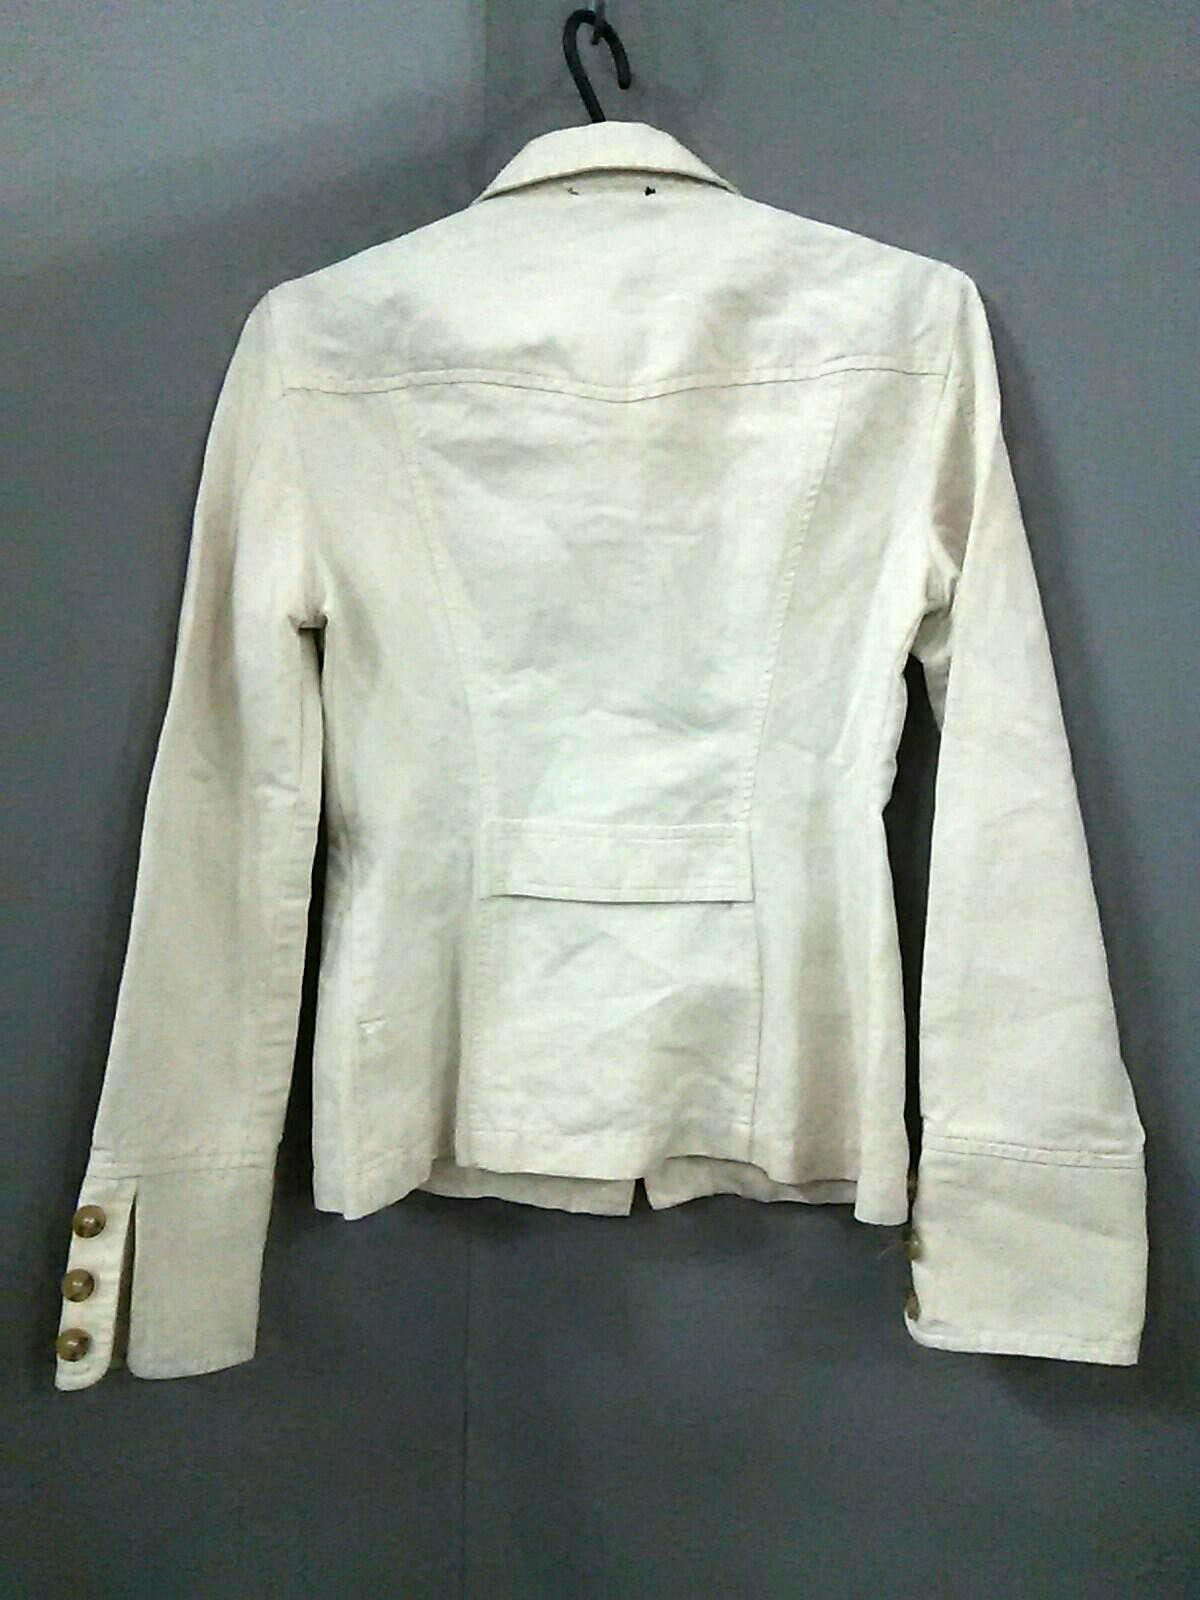 Le Verseau(ルヴェルソー)のシャツブラウス